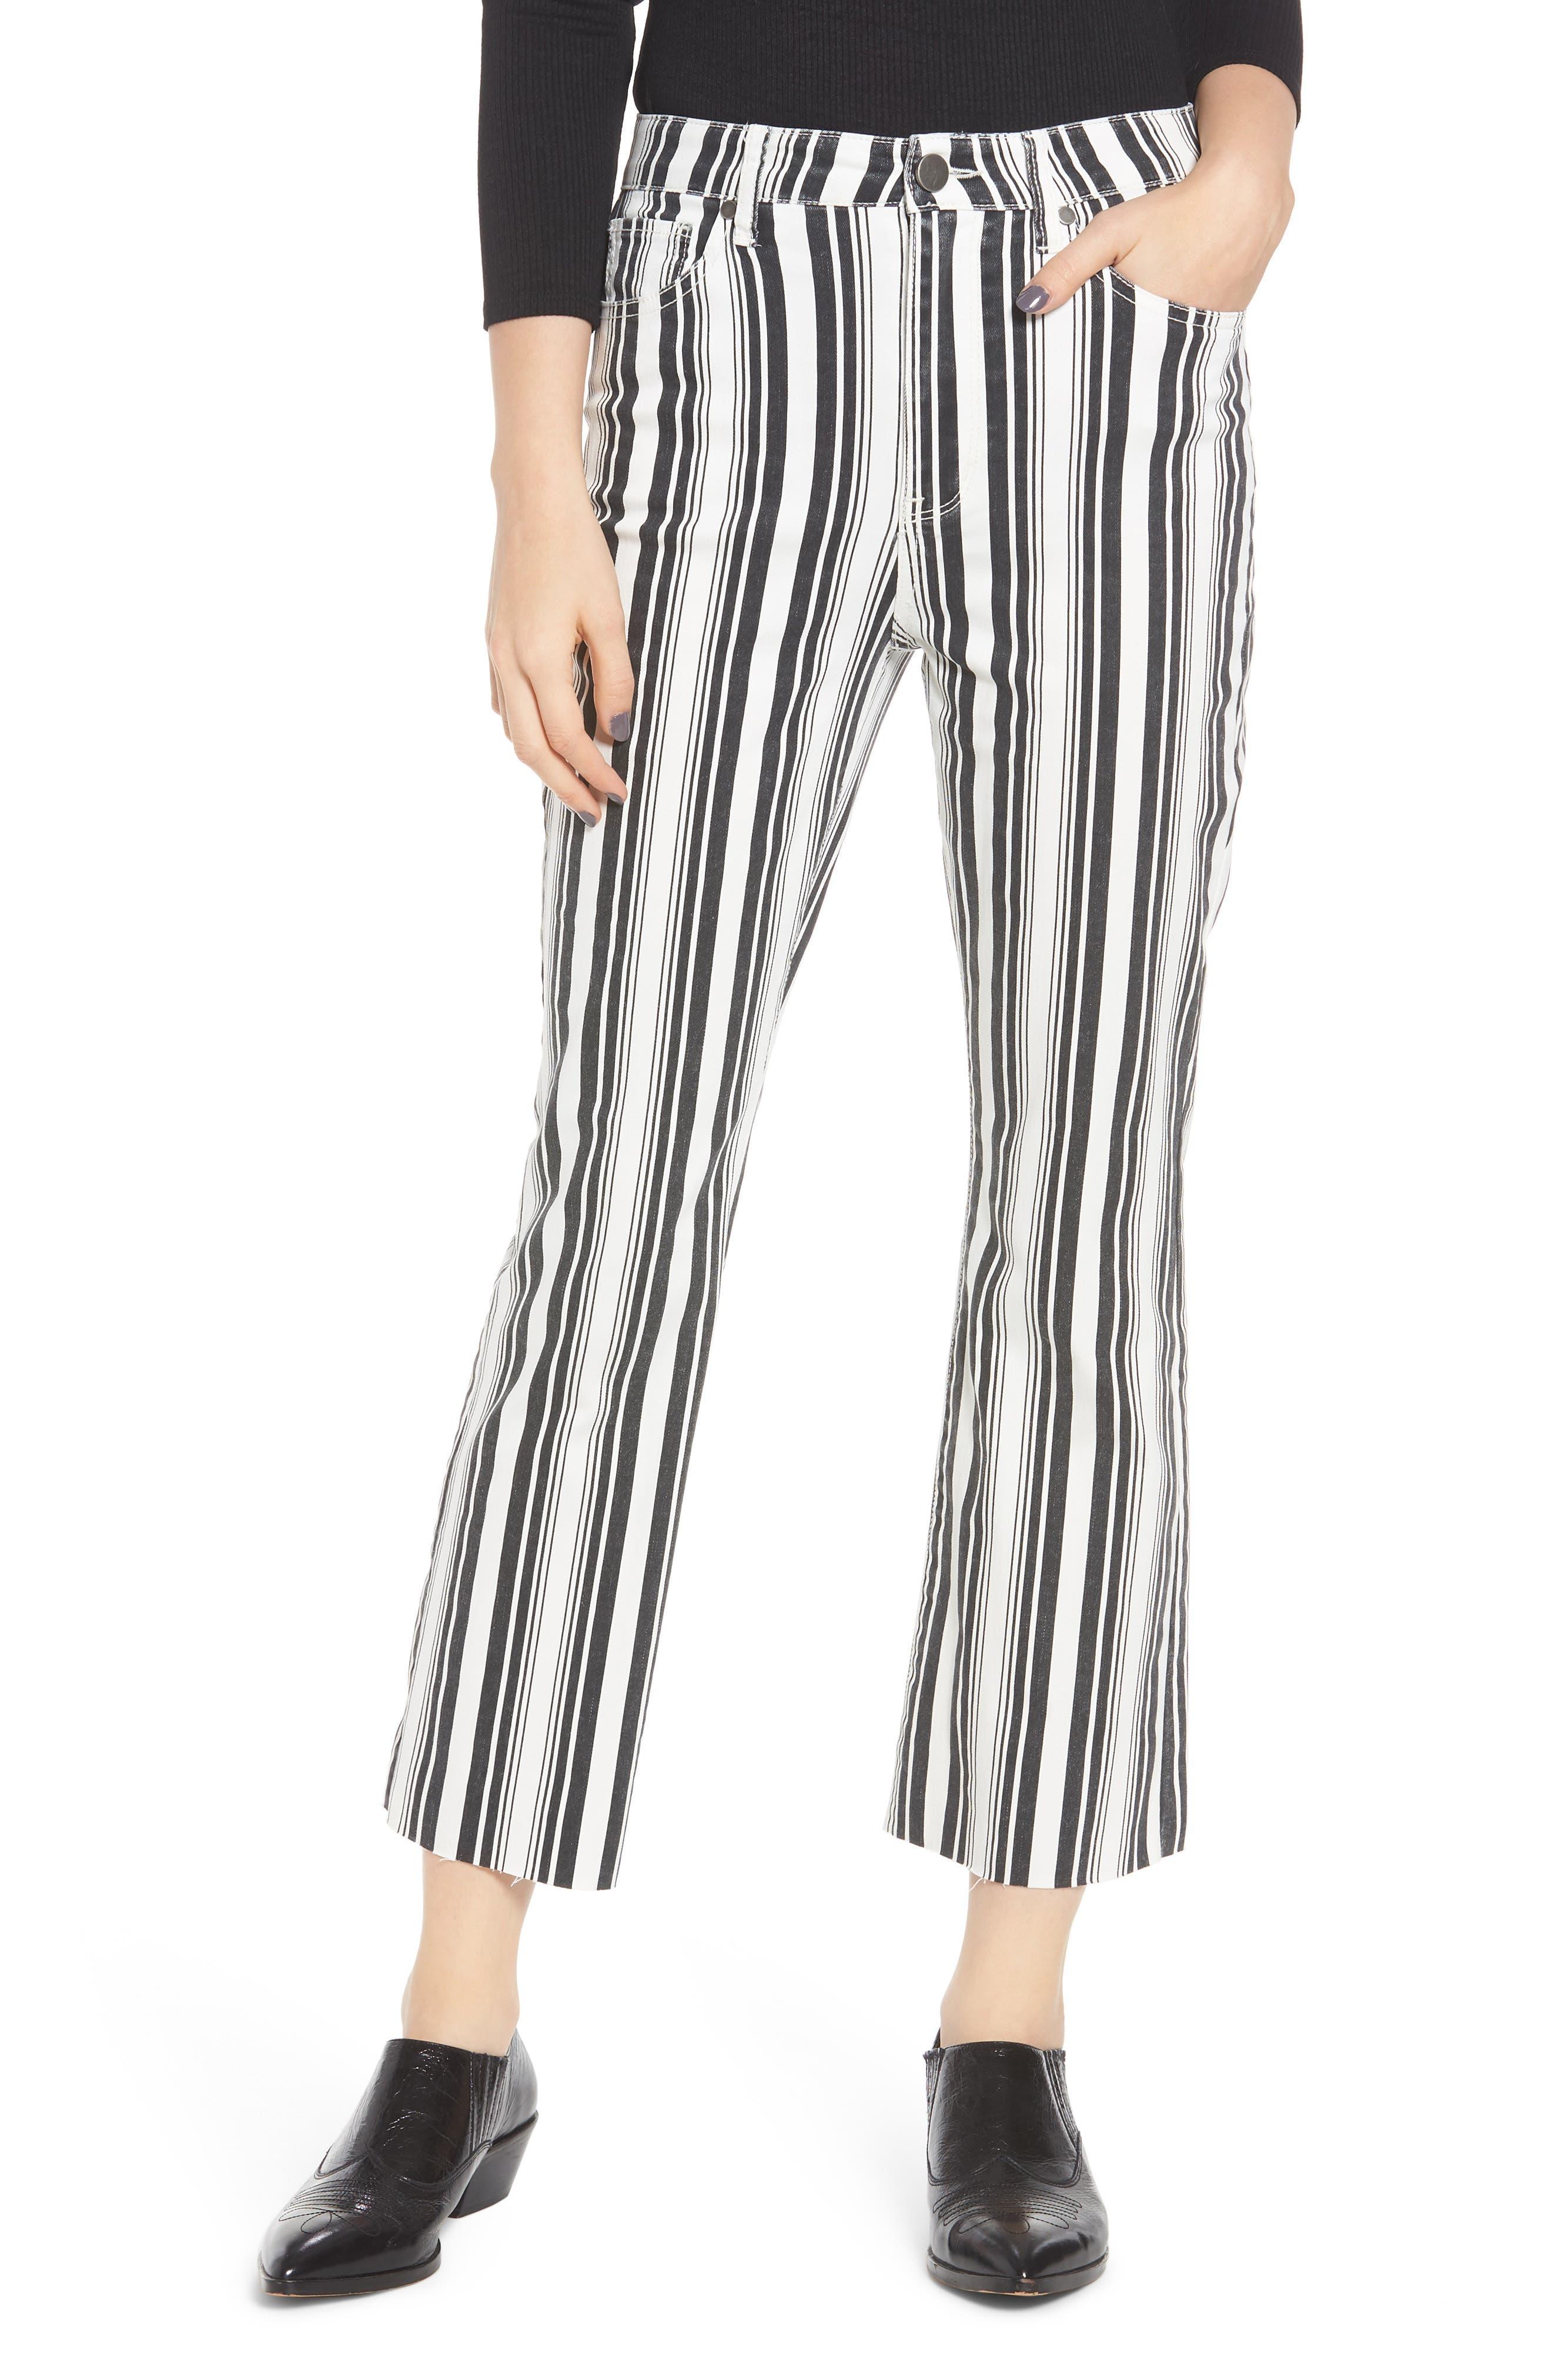 TINSEL Stripe Crop Flare Jeans, Main, color, WHITE BLACK